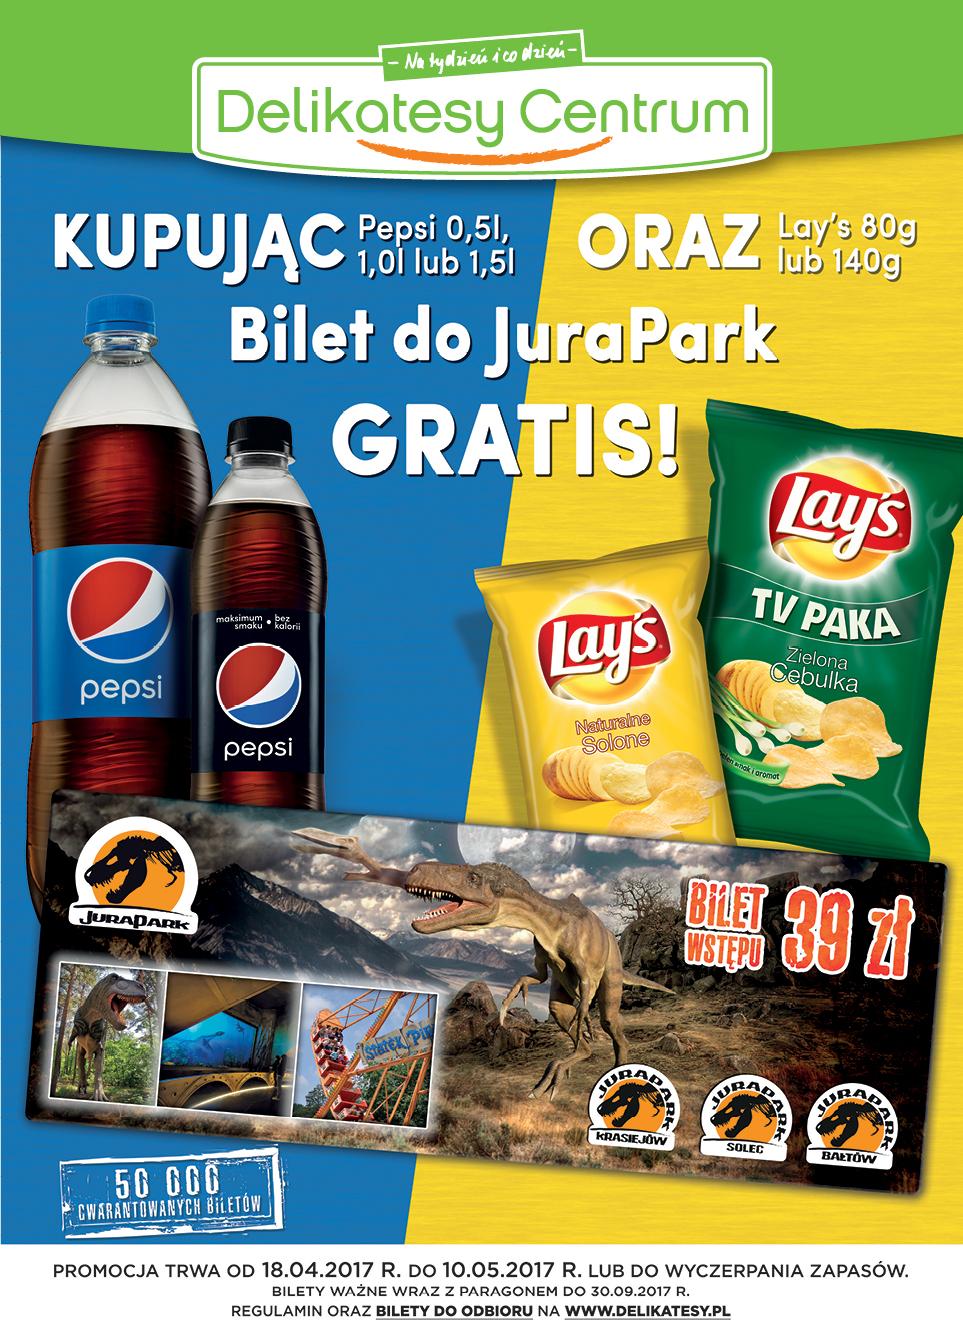 Bilet do JuraPark gratis za zakup dowolnego napoju Pepsi i dowolnej paczki Lay's @ Delikatesy Centrum